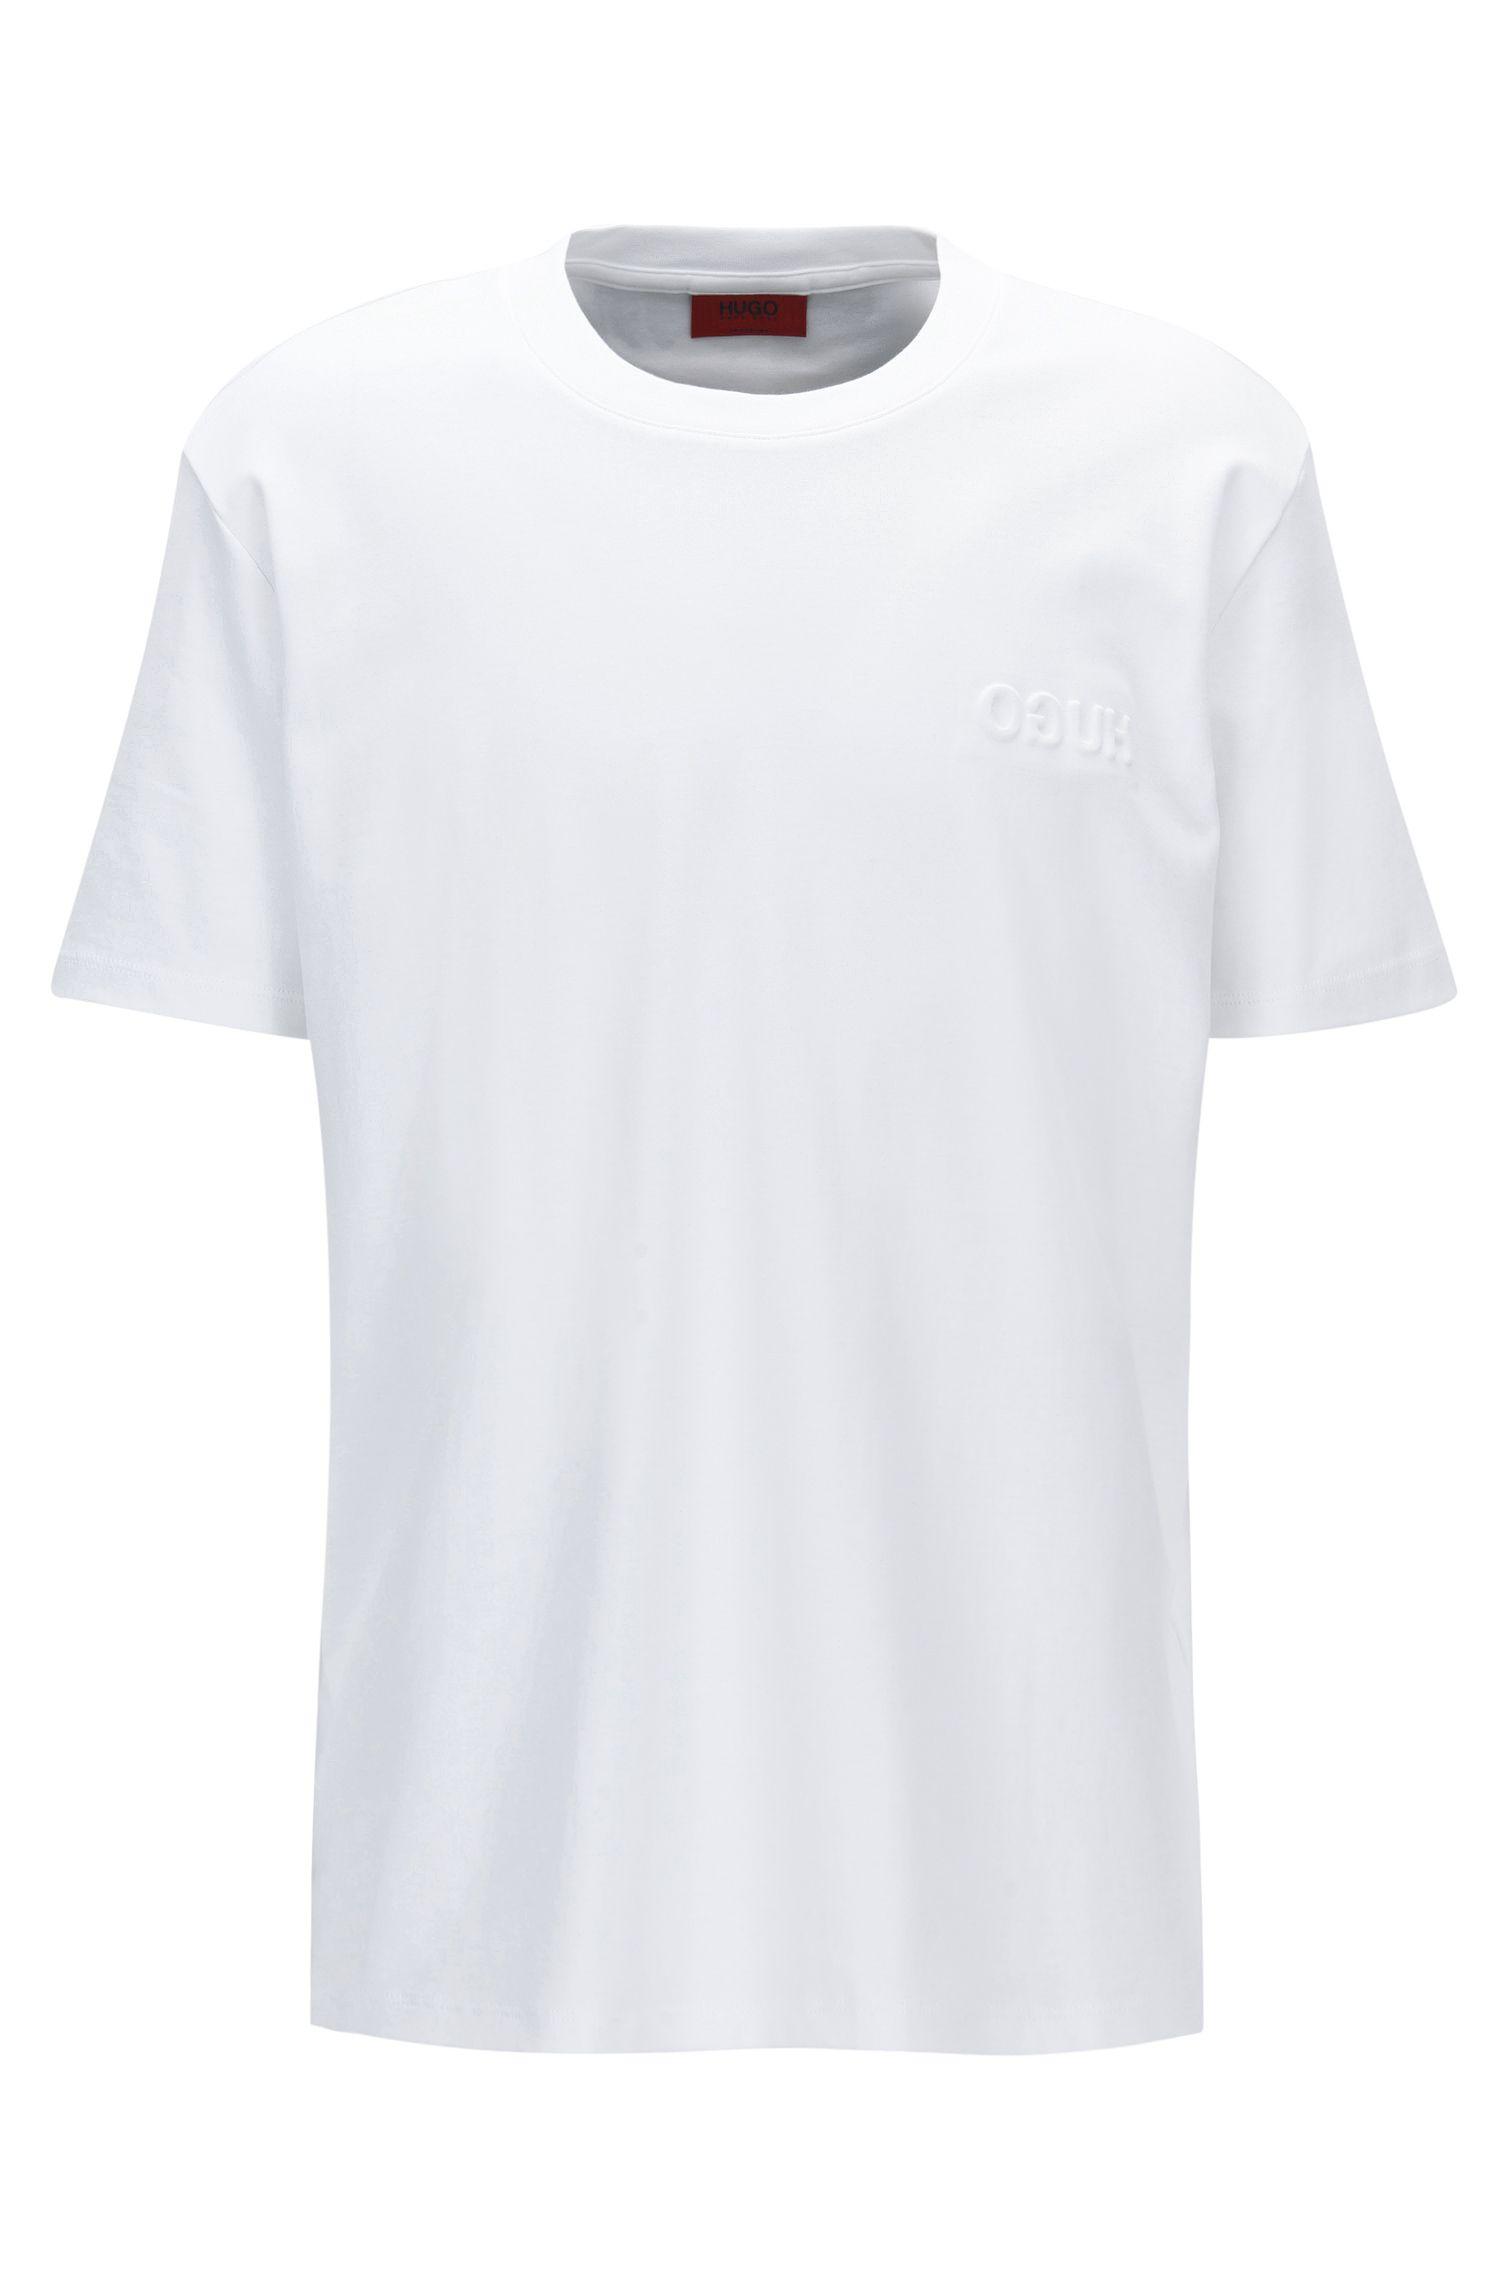 Camiseta oversized fit en algodón Pima